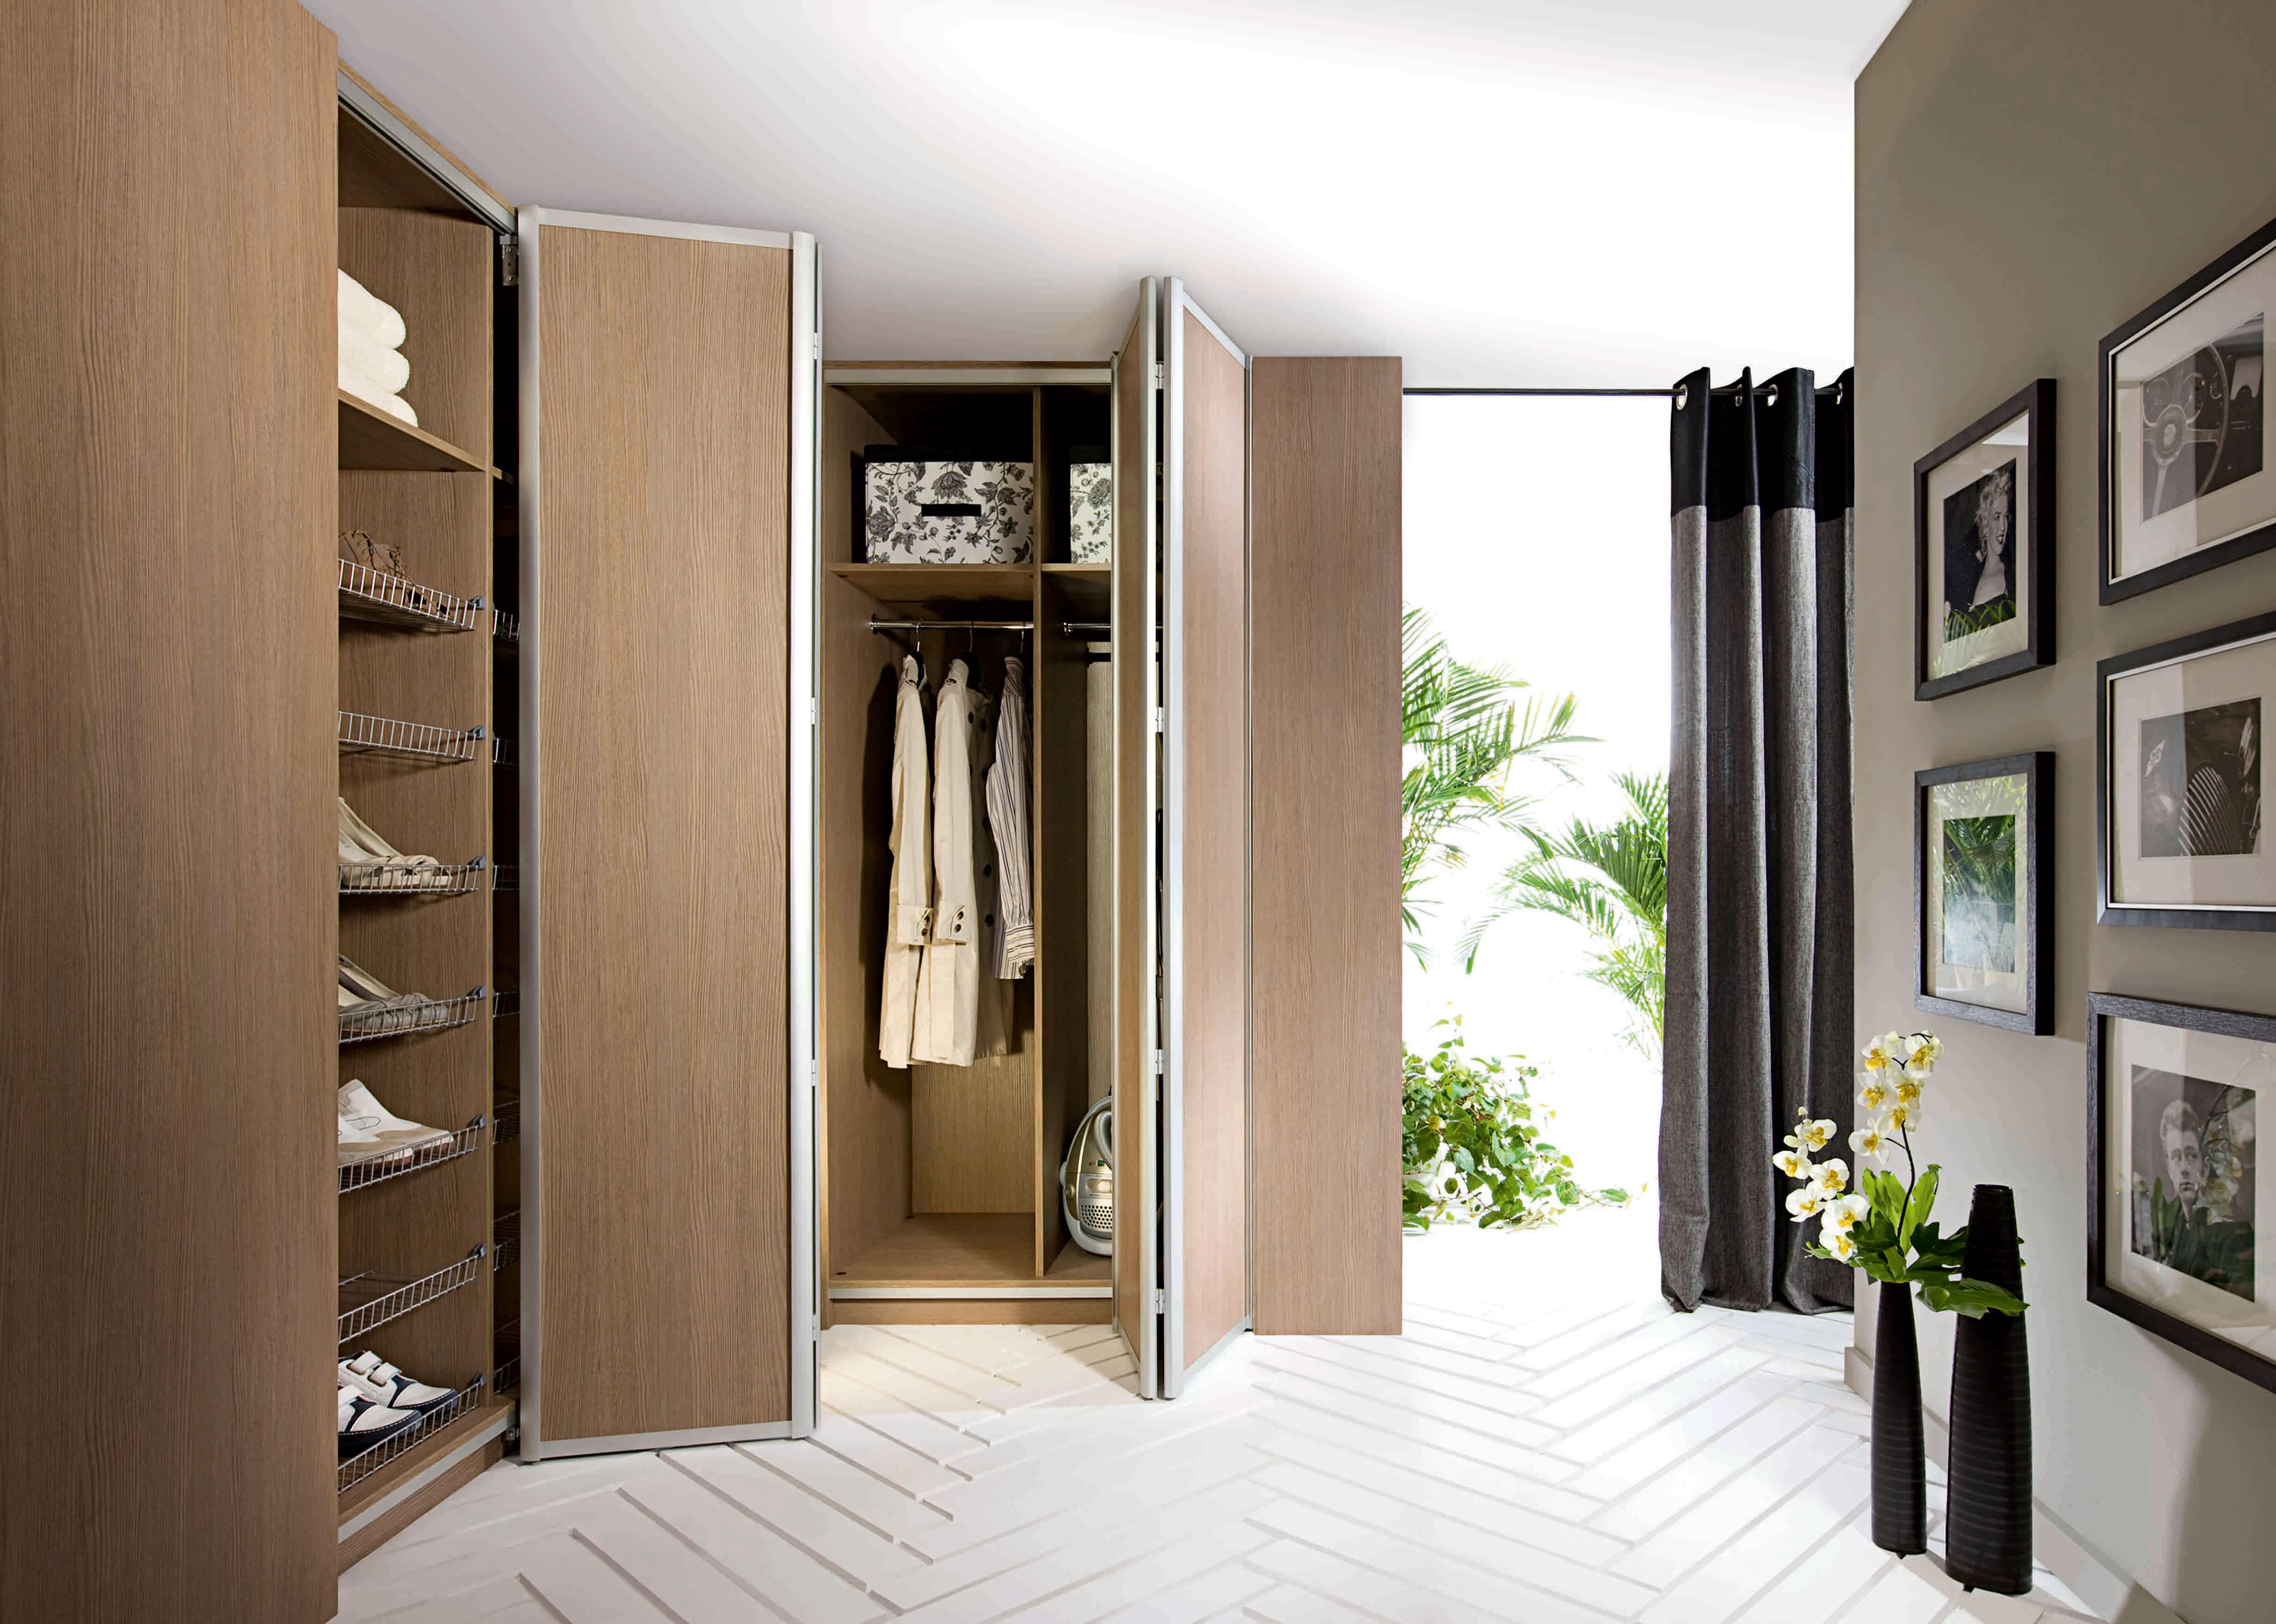 portes pliantes. Black Bedroom Furniture Sets. Home Design Ideas